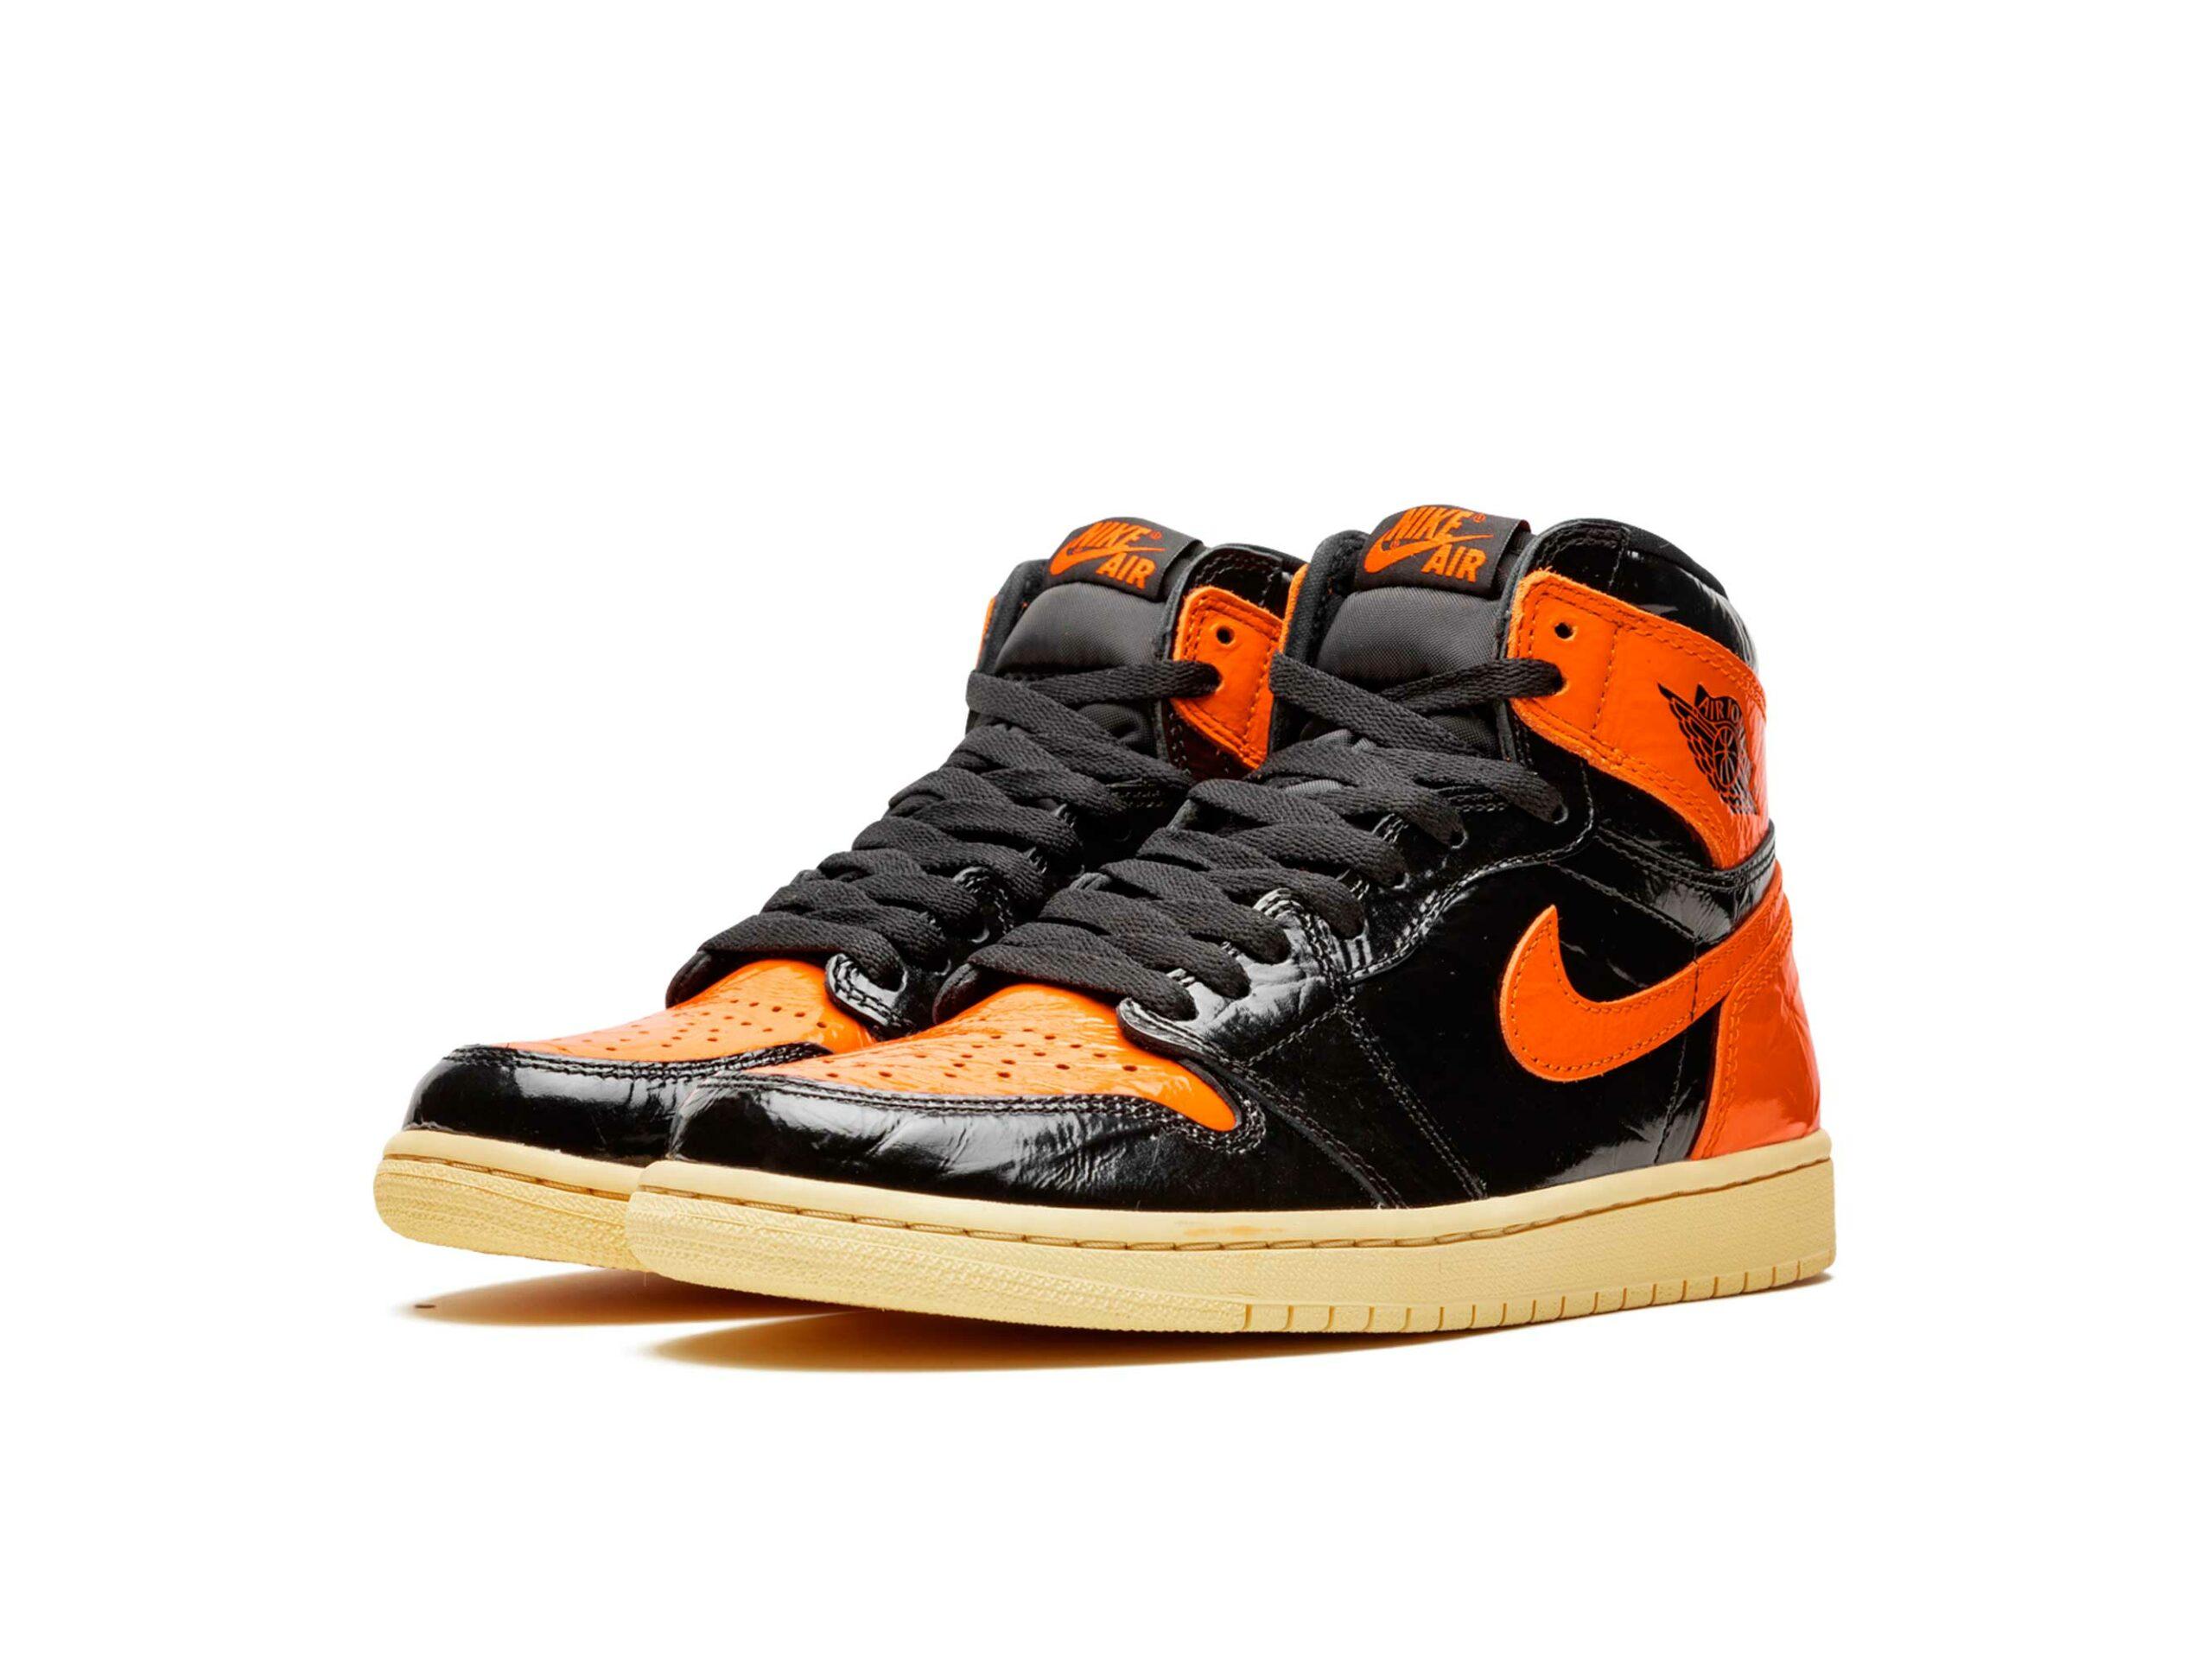 nike air Jordan 1 retro high og shattered backboard 555088_028 купить